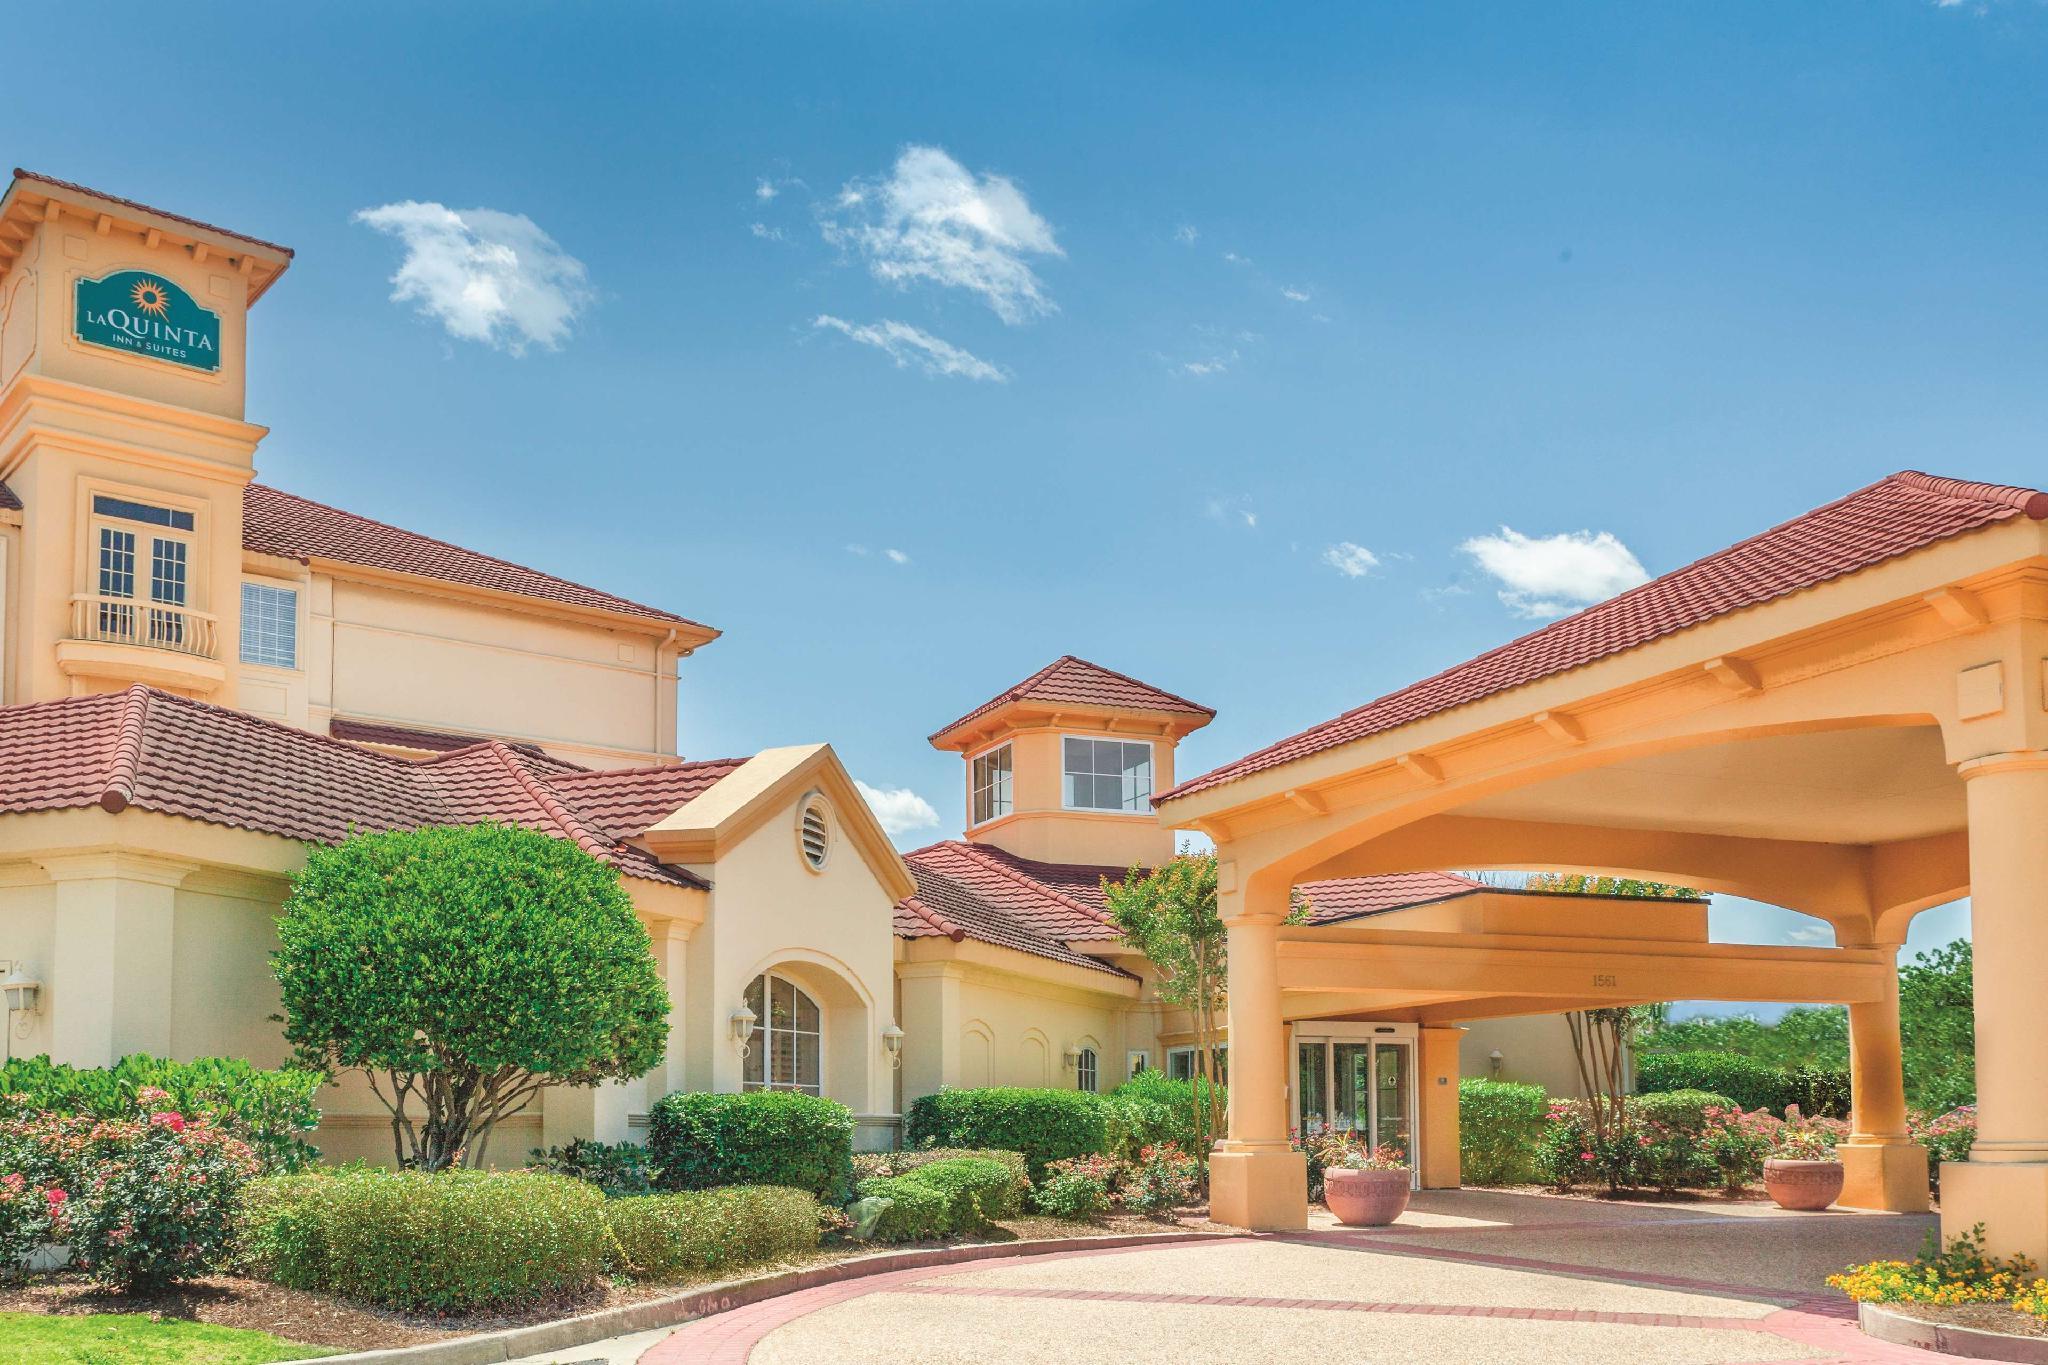 La Quinta Inn & Suites By Wyndham Myrtle Beach Broadway Area